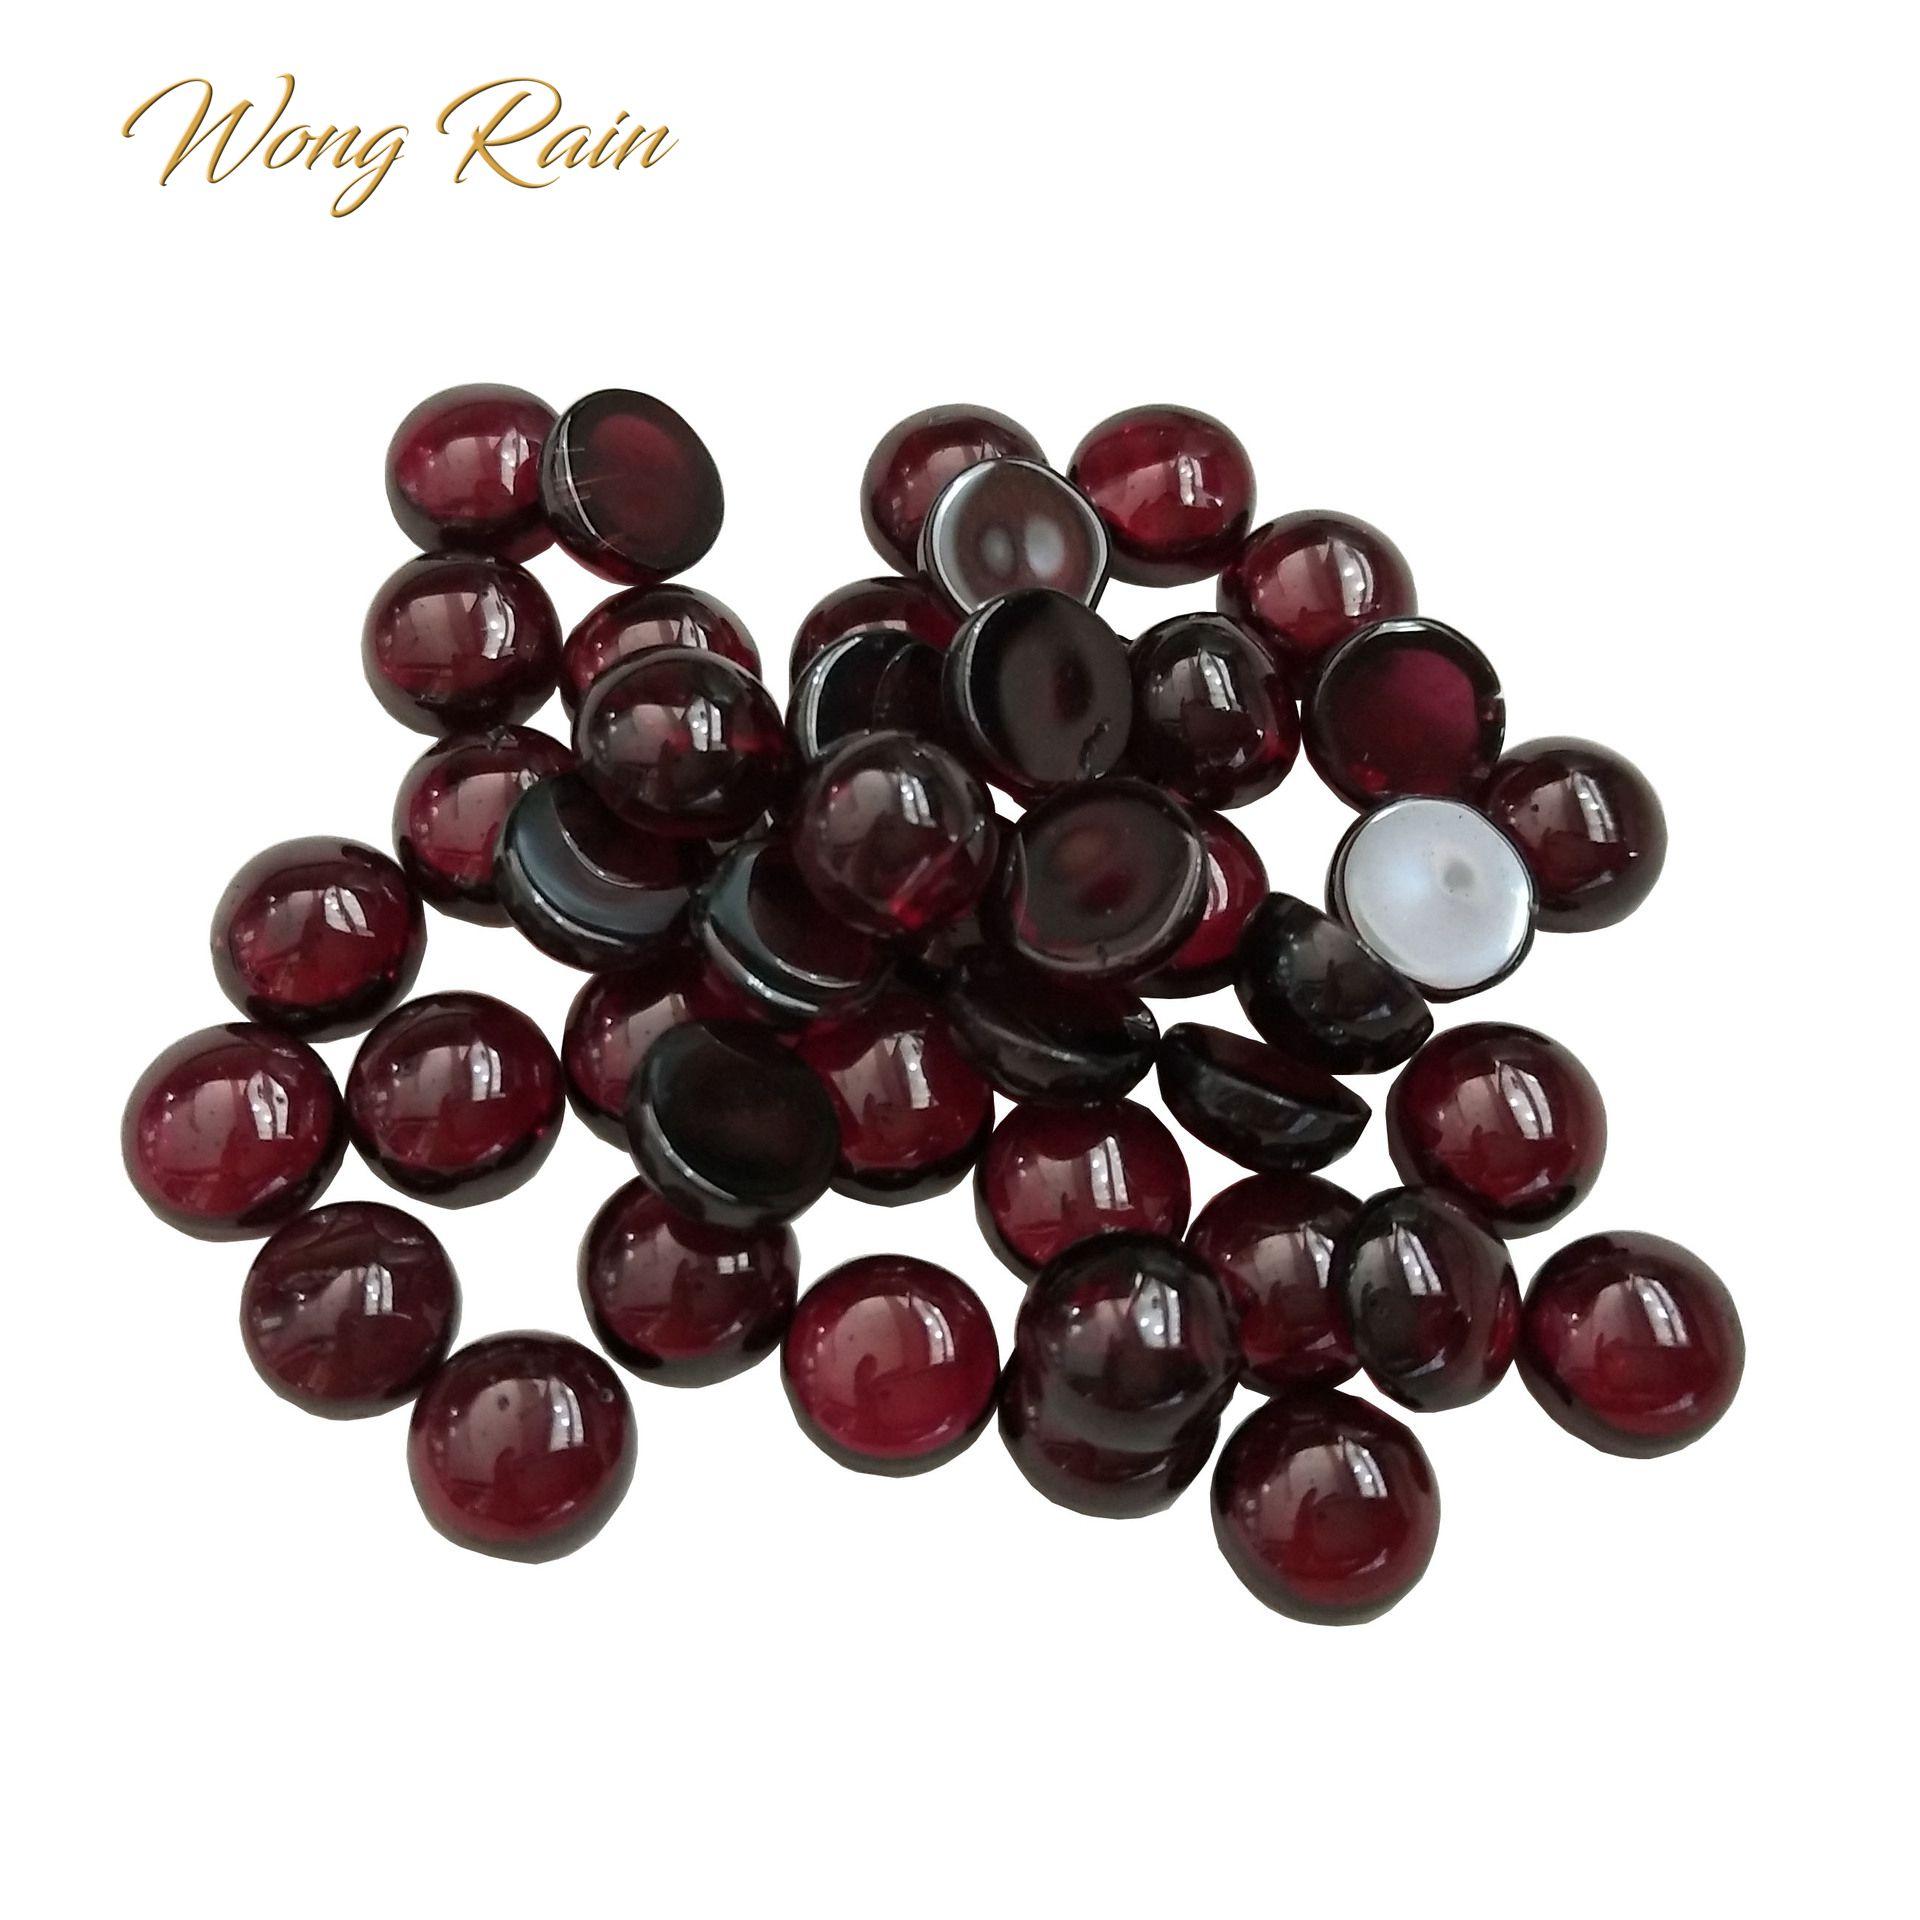 Wong Rain Top Quality 1 PCS Natural 6 MM Round Cut Garnet Loose Gemstone DIY Stones Decoration Jewelry Wholesale Lots Bulk